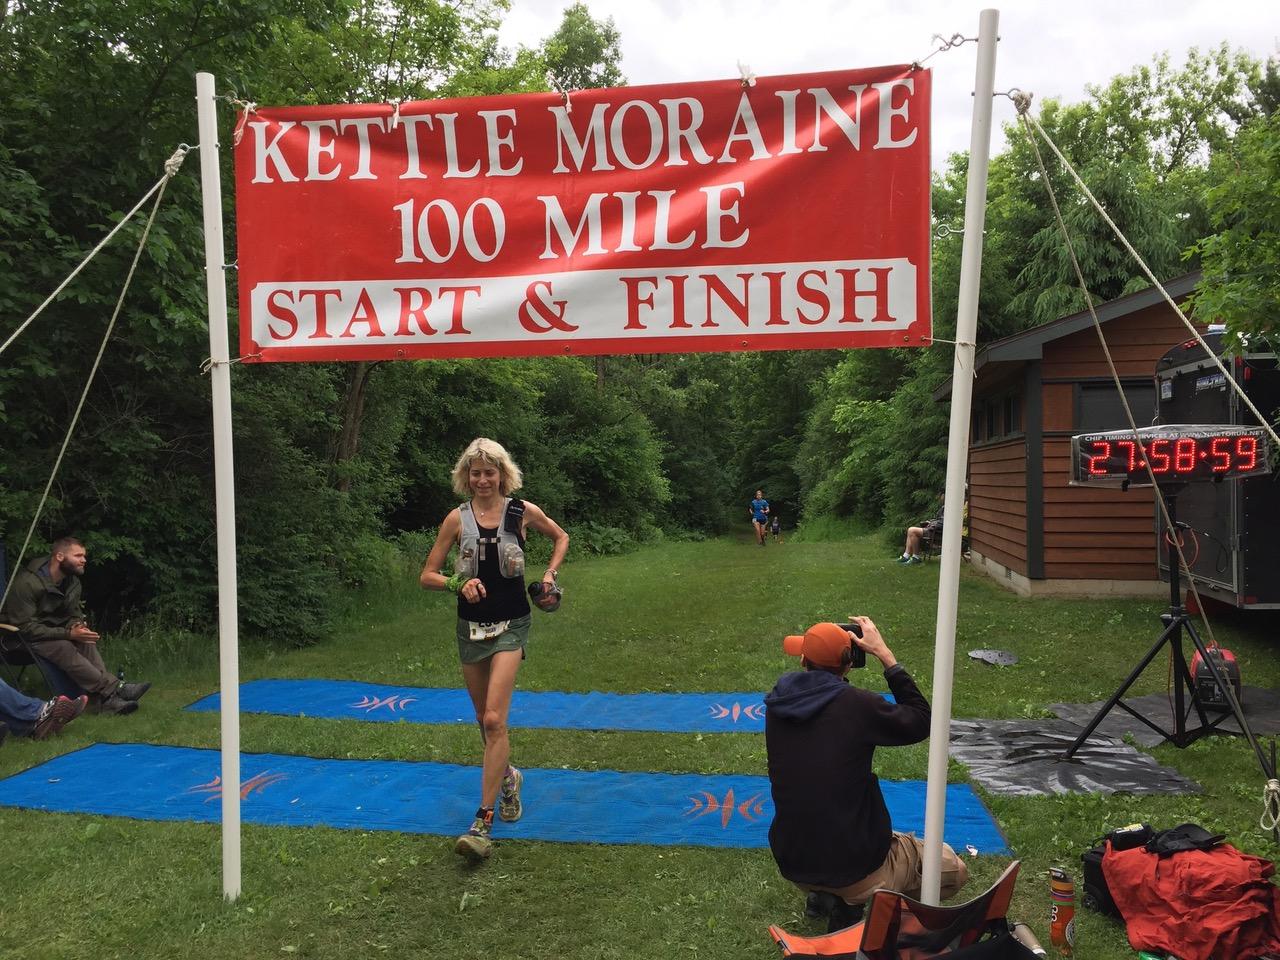 Ultramarathon mindset coach Susan Donnelly finishes Kettle Moraine 100-mile race despite crazy odds